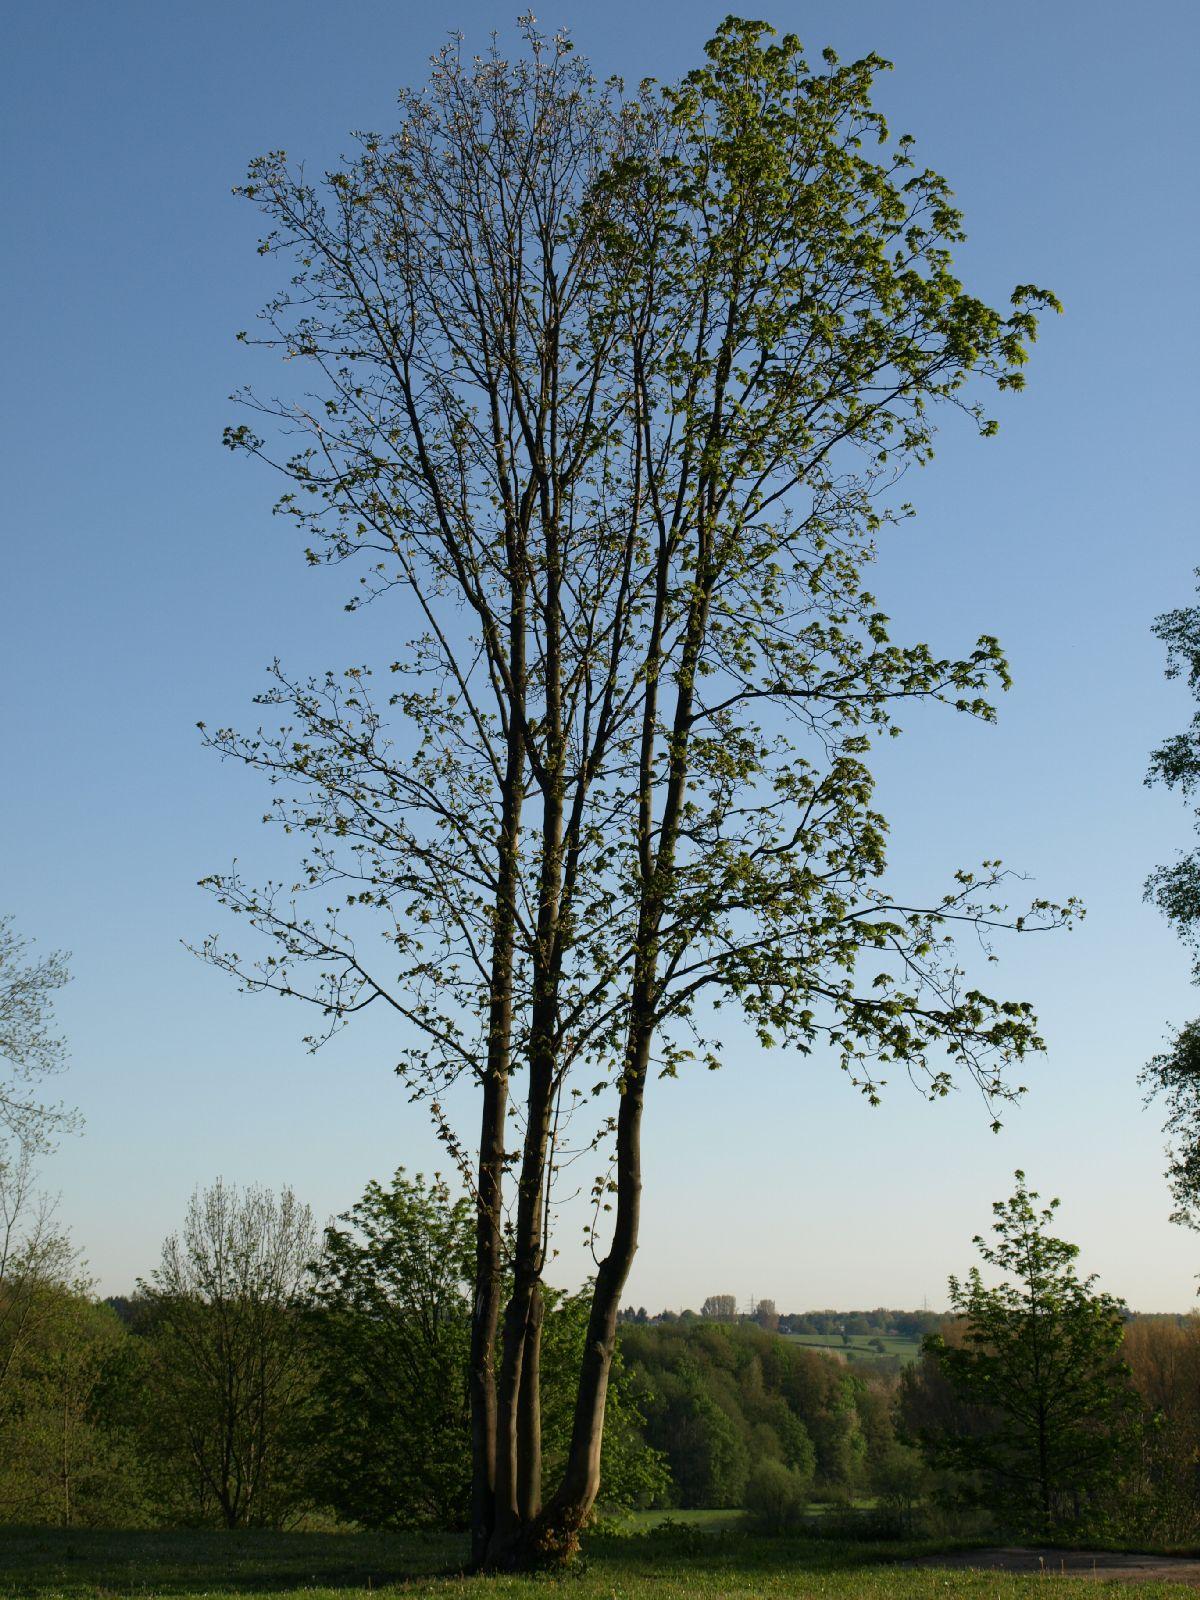 Pflanzen-Baum-Foto_Textur_B_P5052513